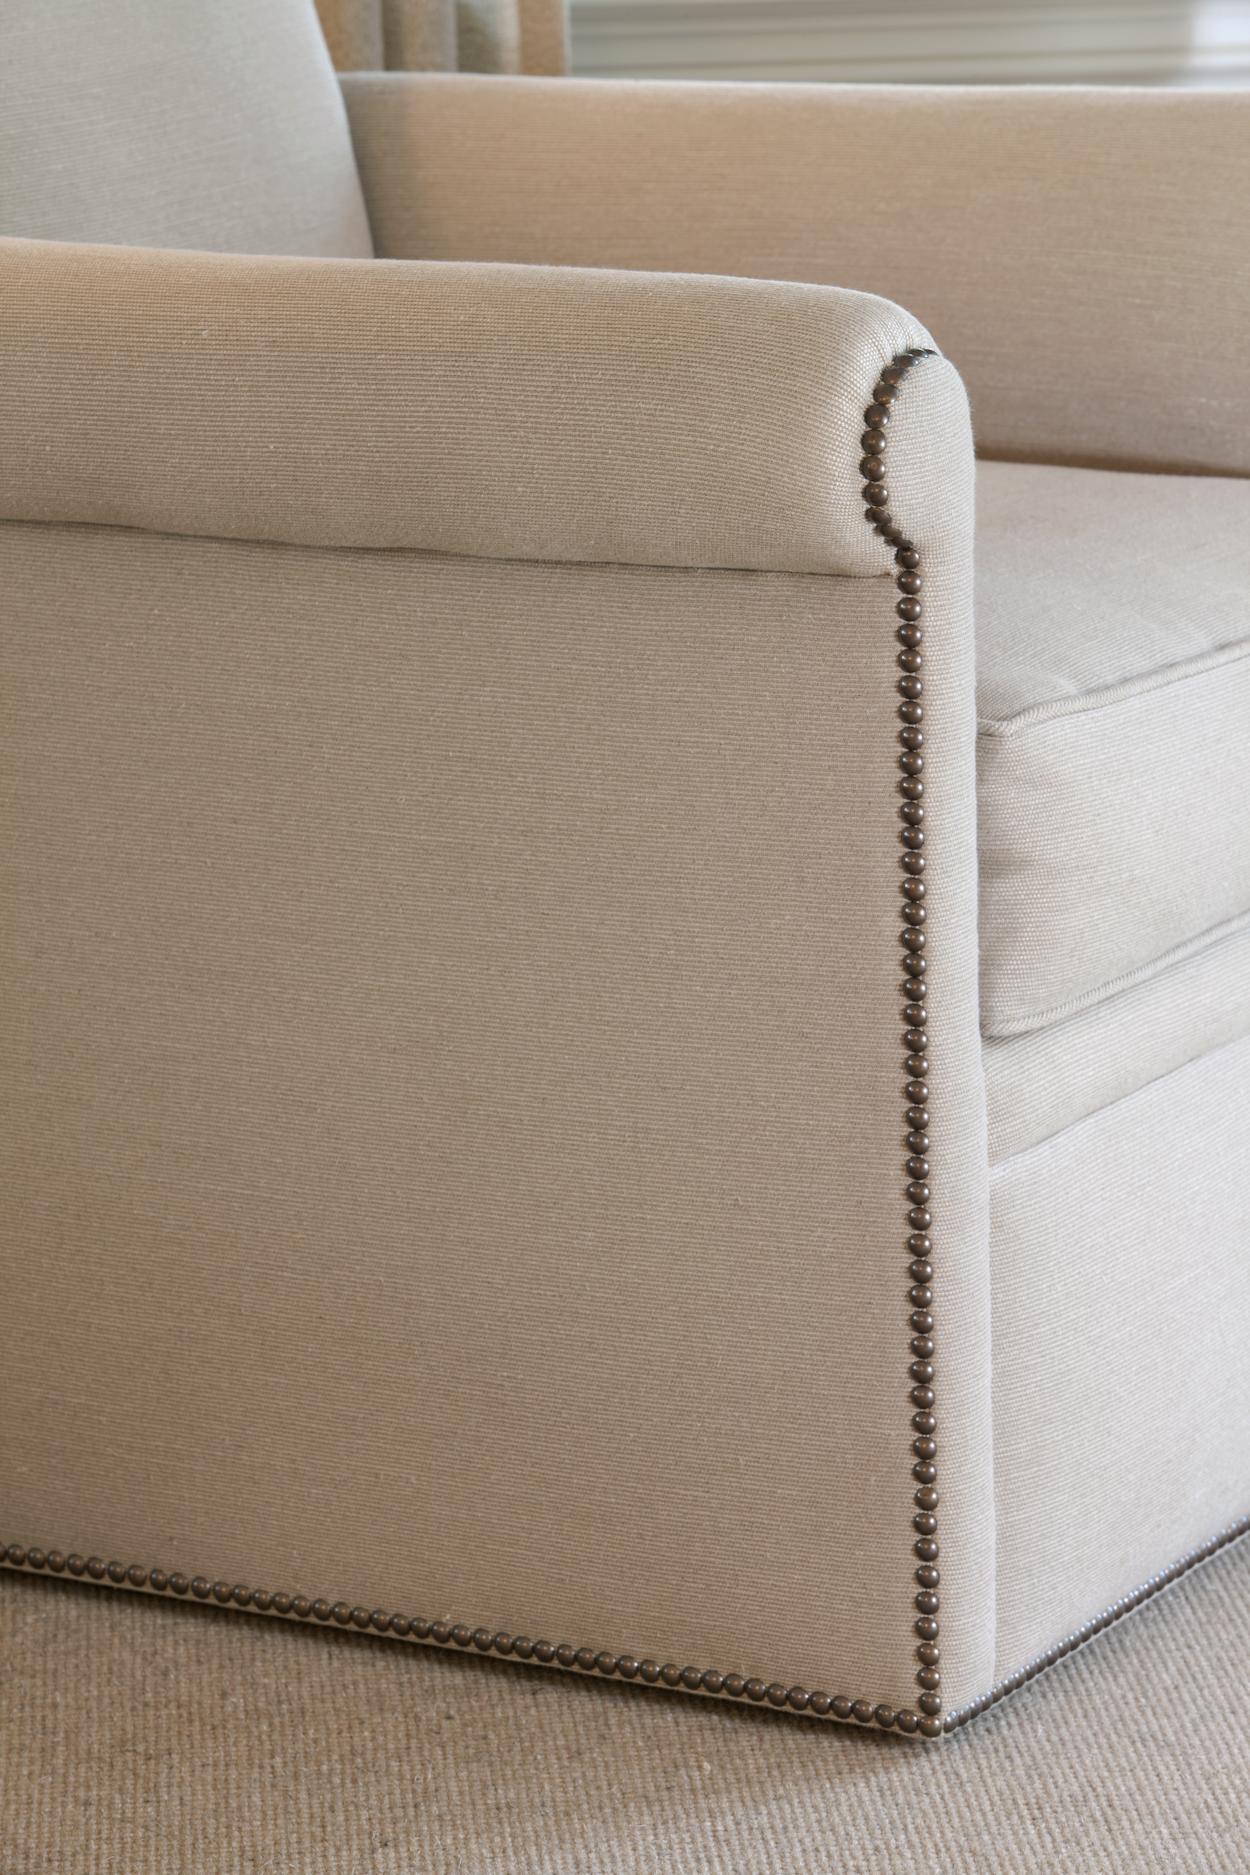 5 chair side detail.jpg